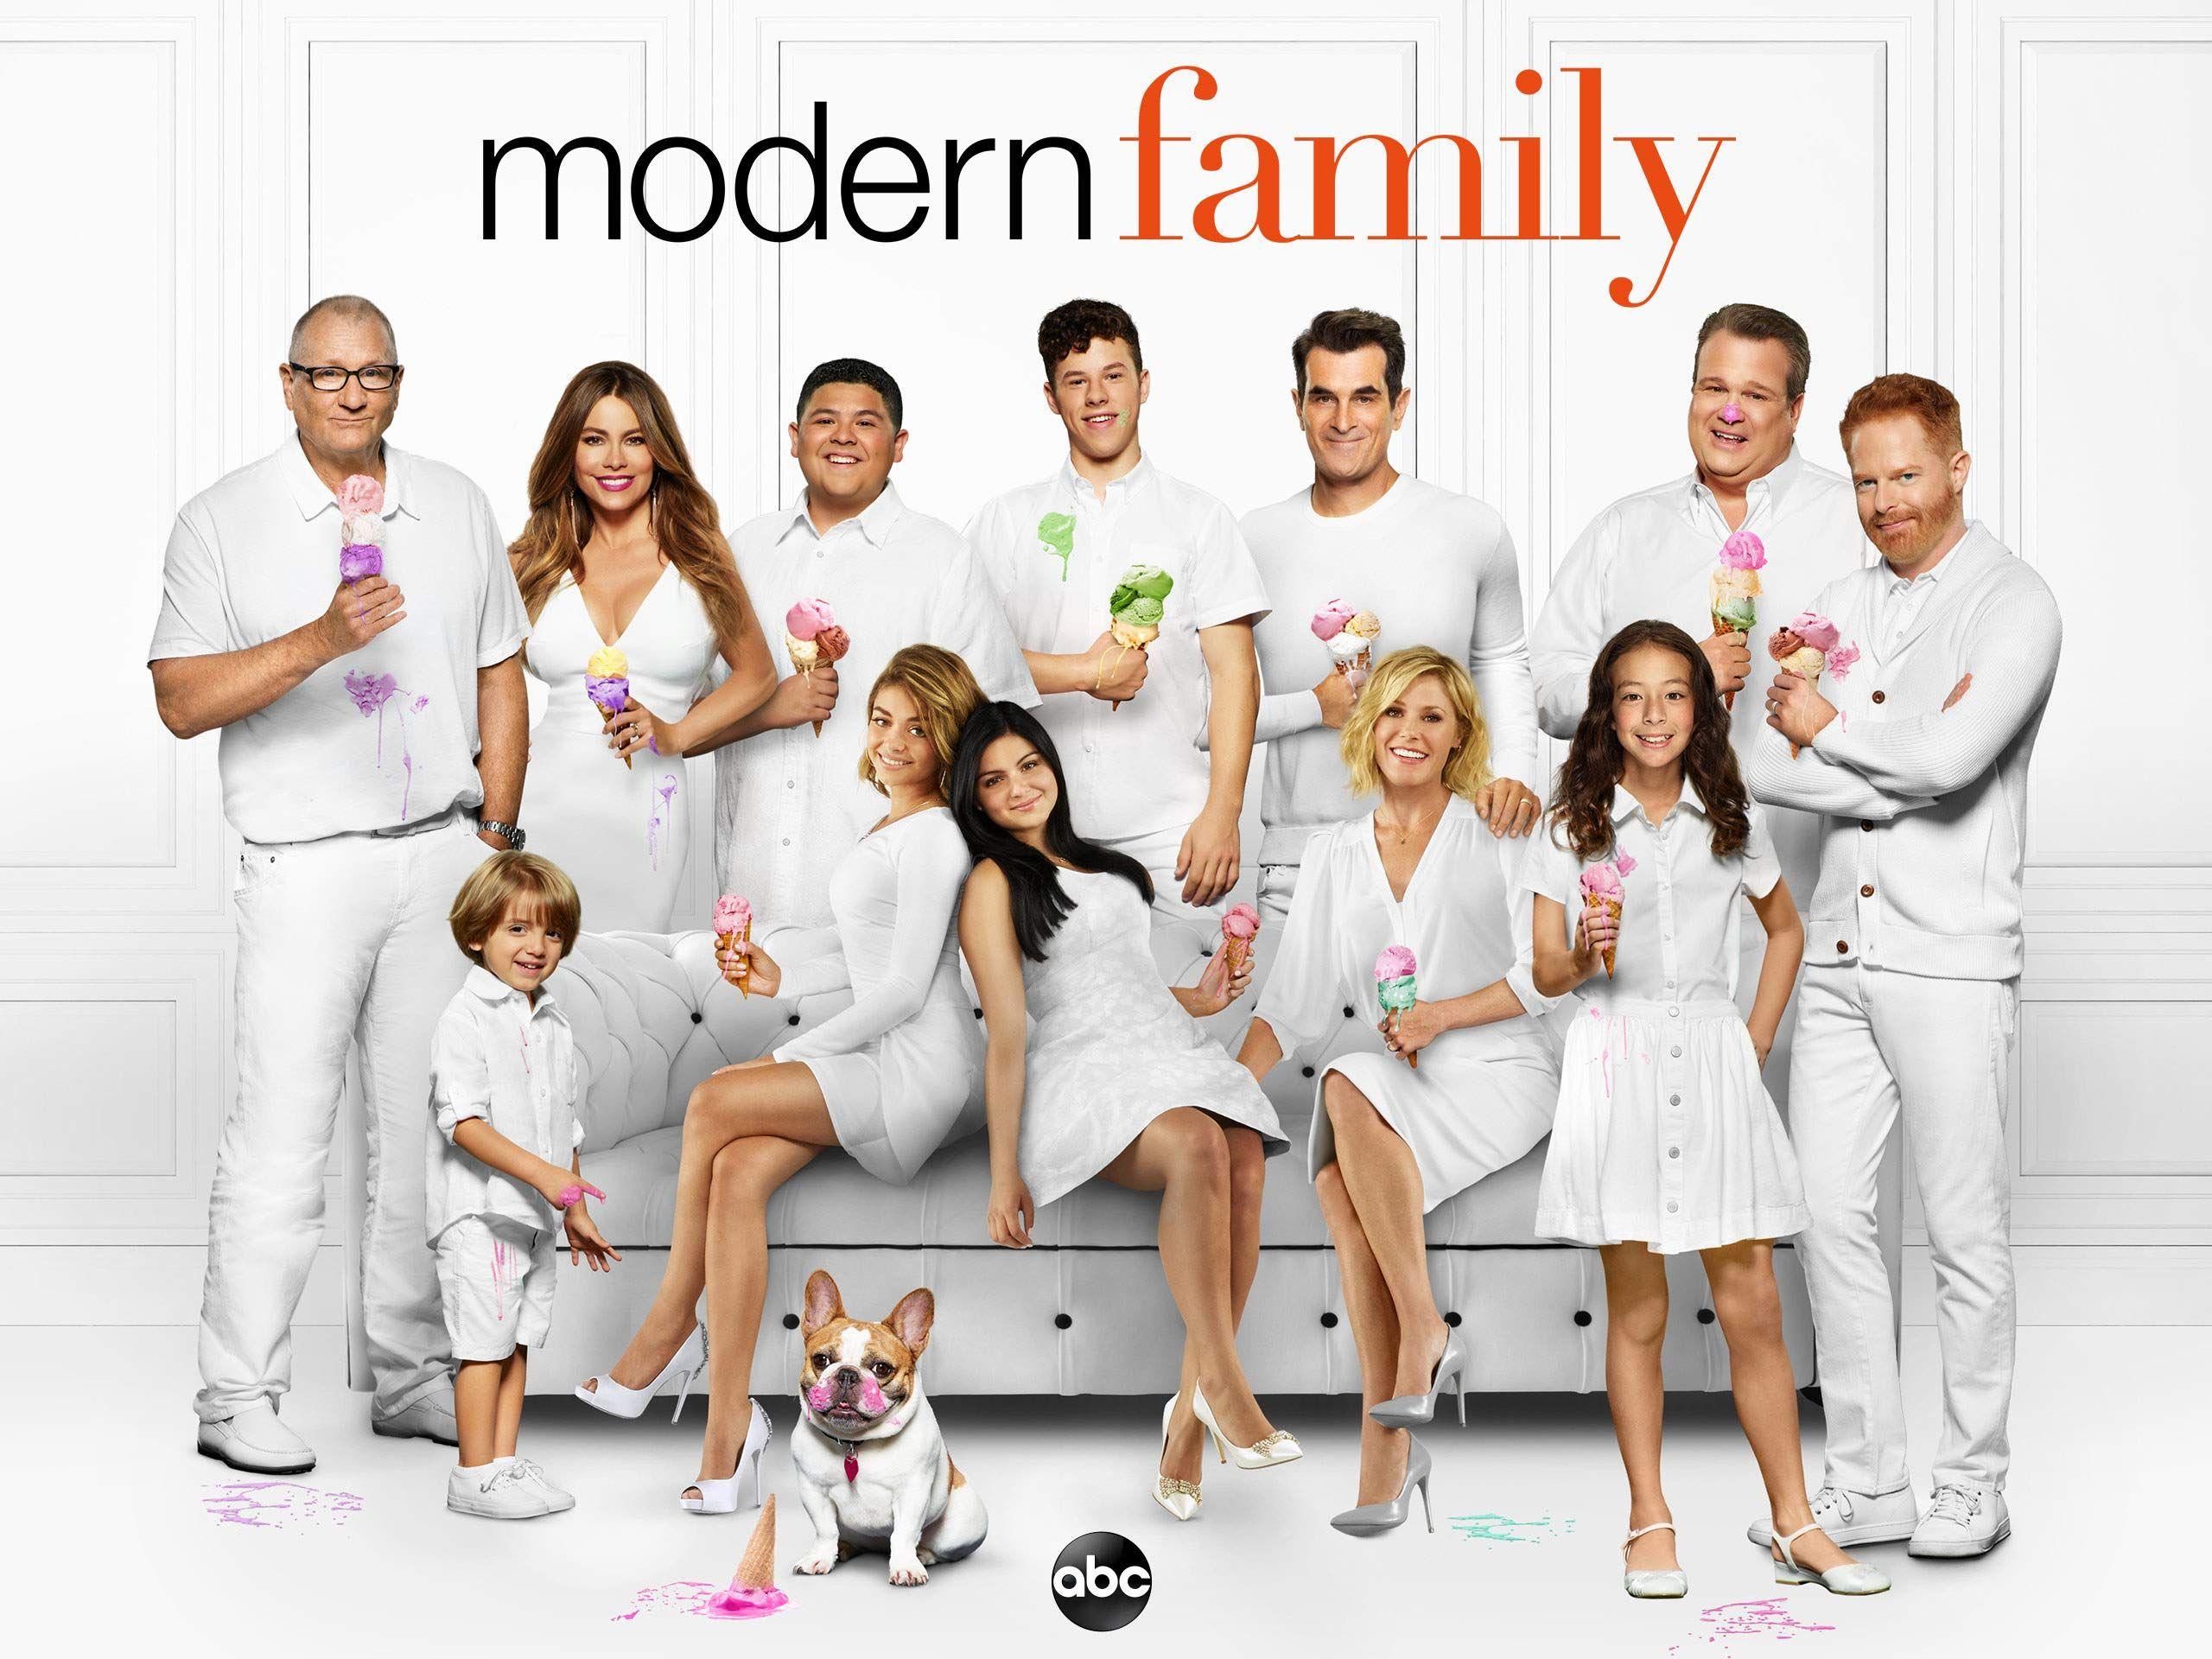 Resultado de imagen para modern family